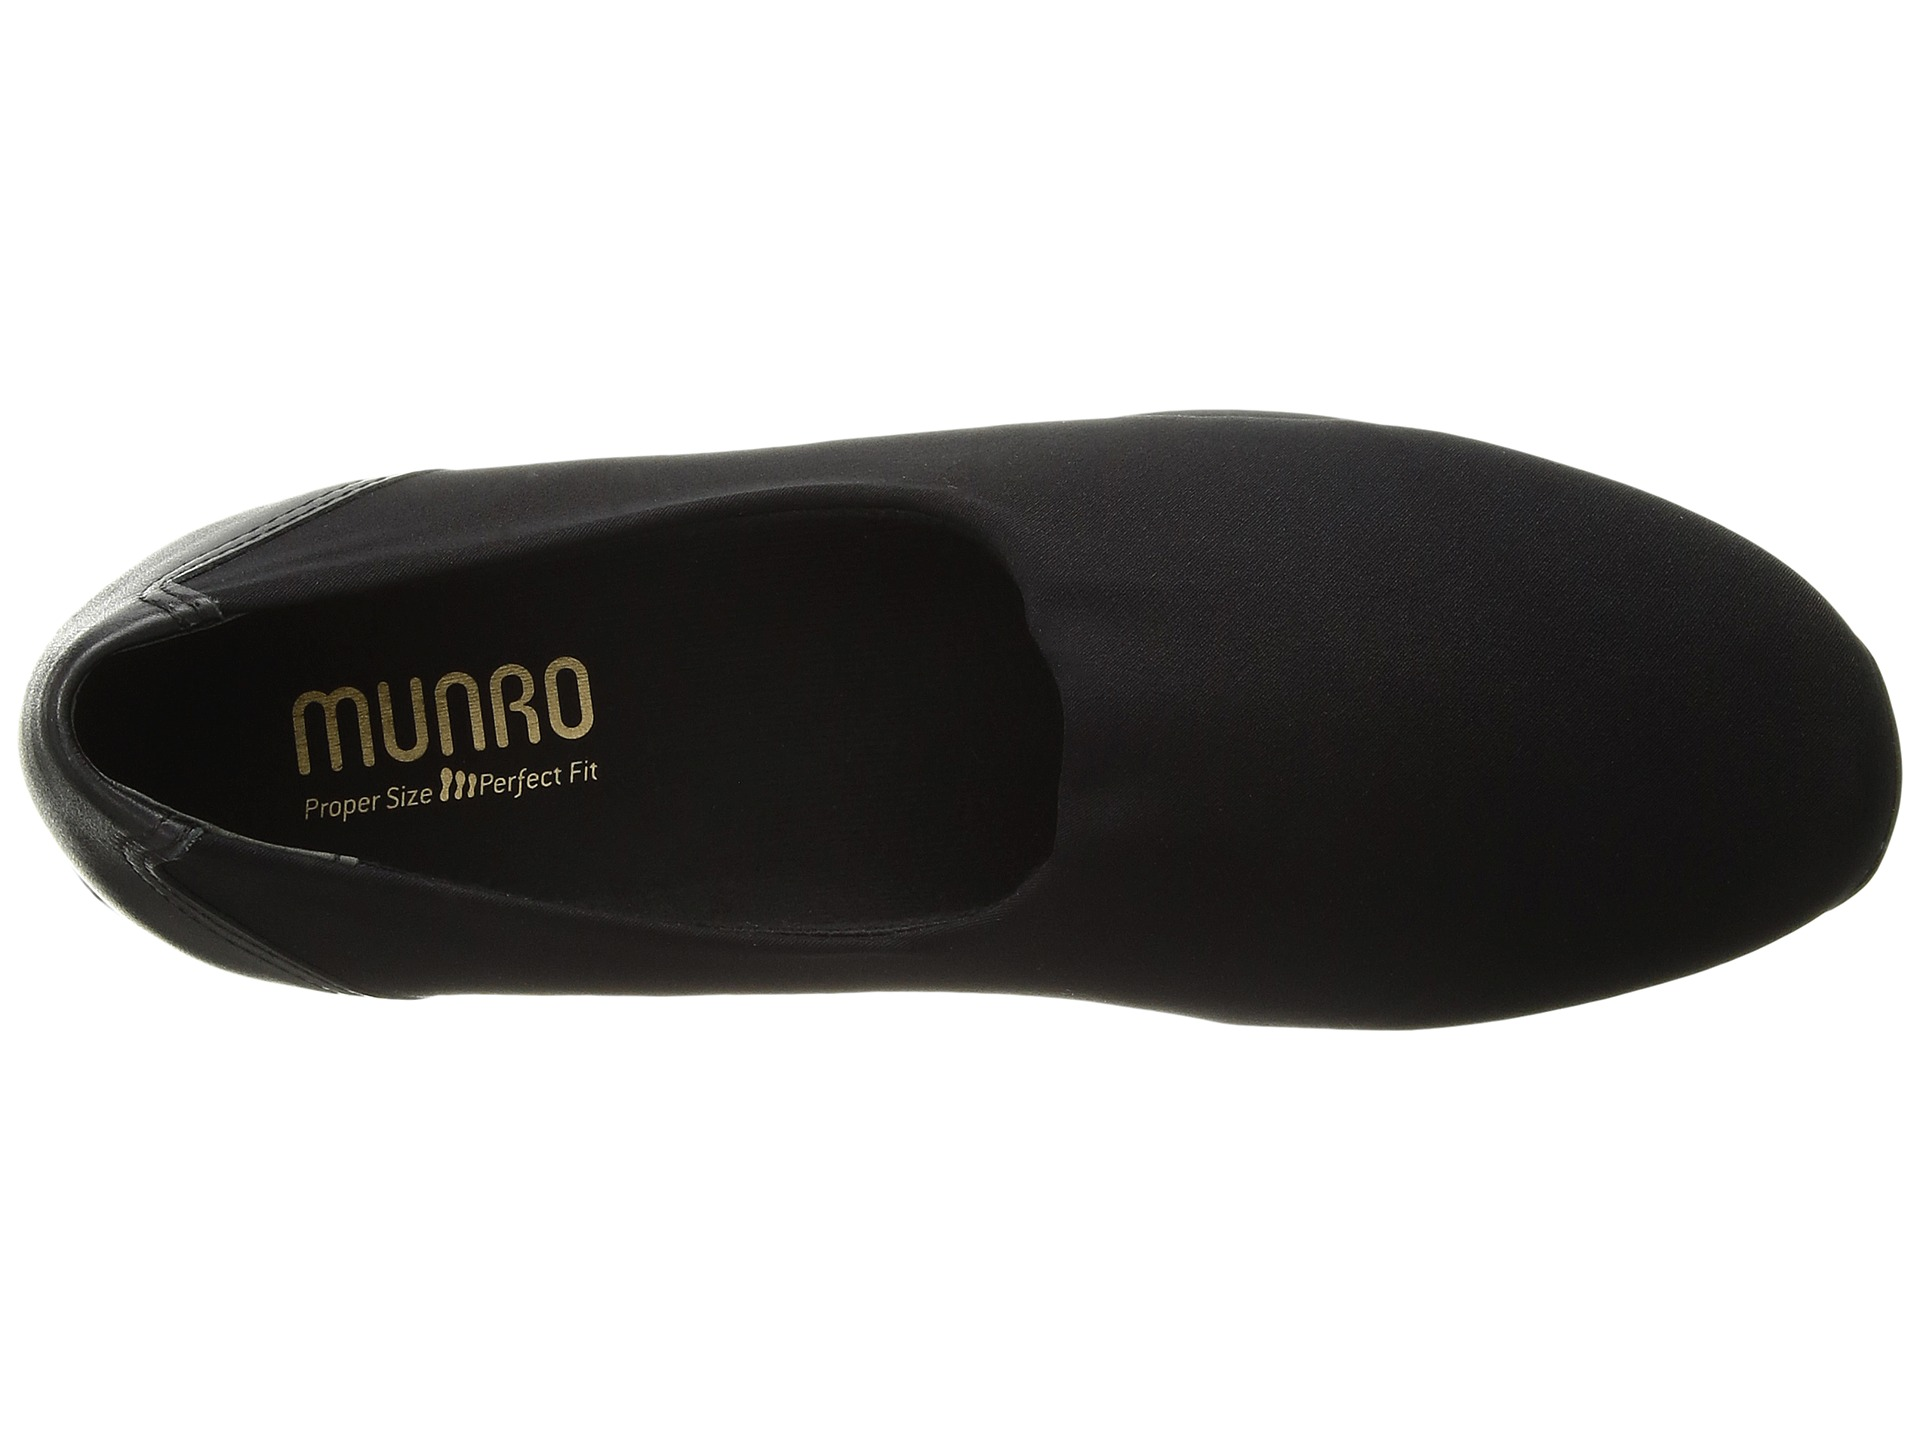 Munro American Shoes SALE   6pm.com